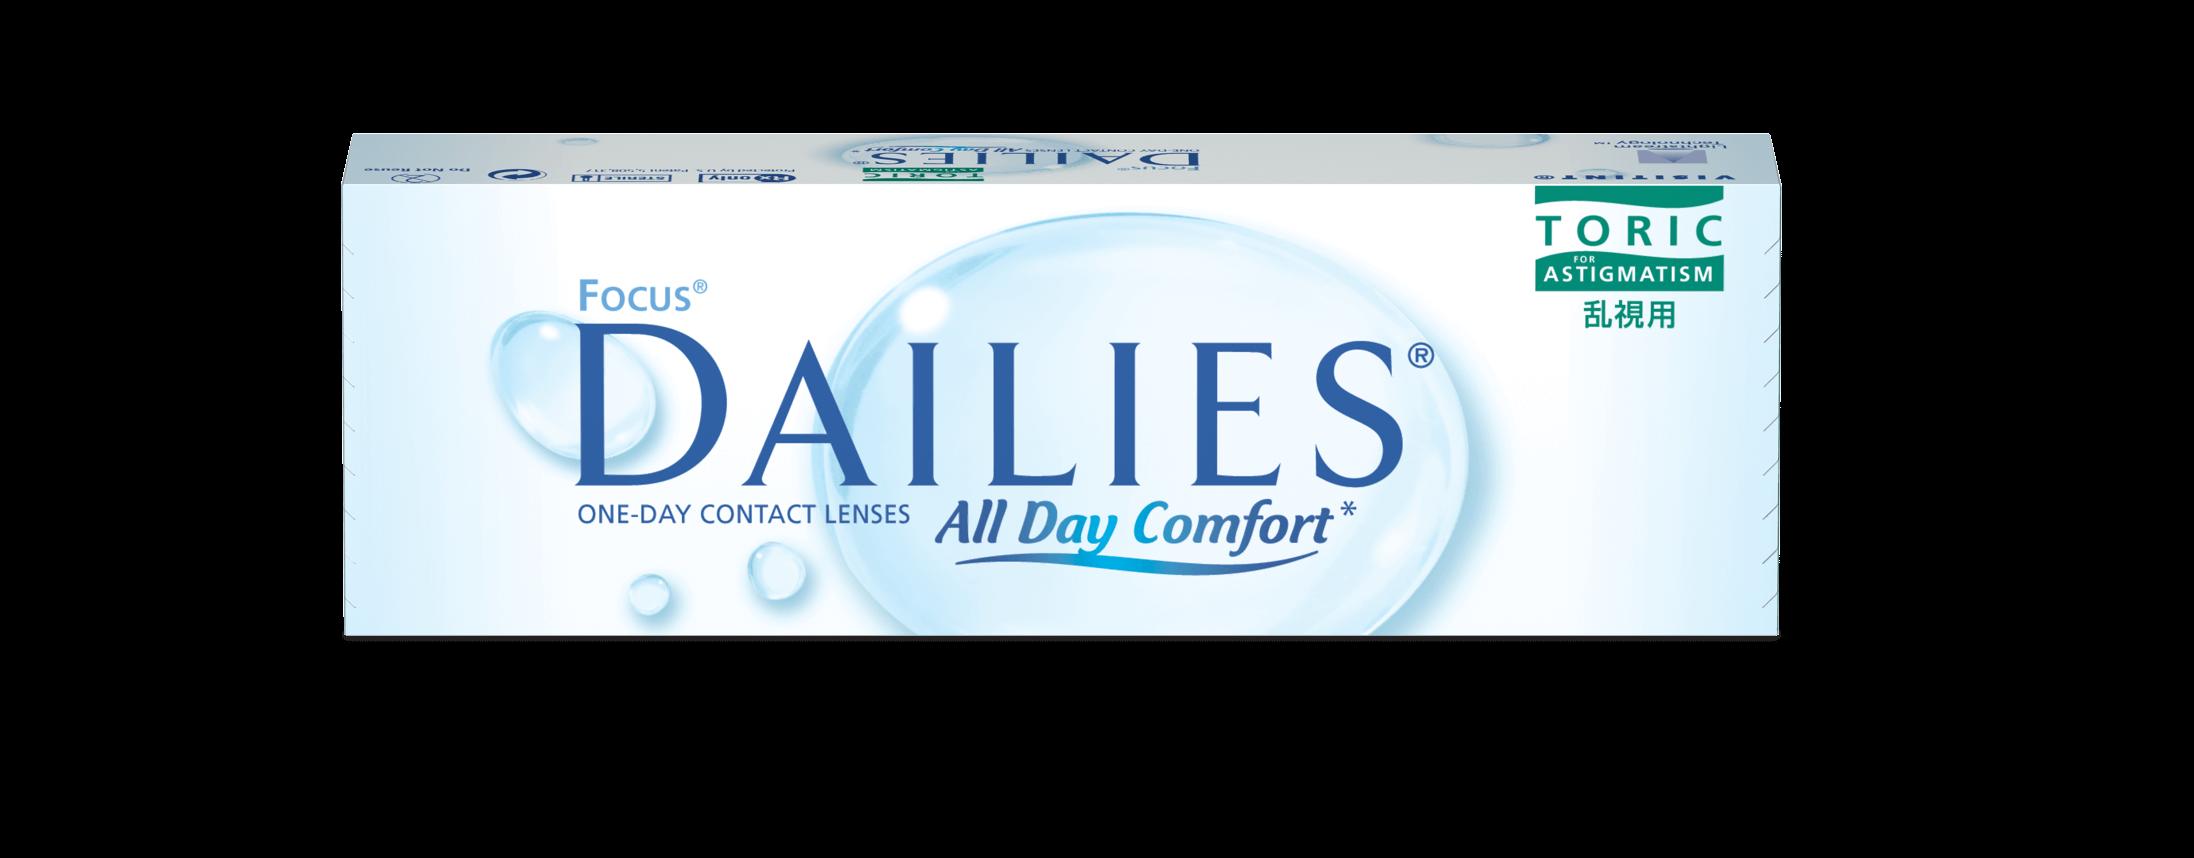 focus-dailies-toric-30